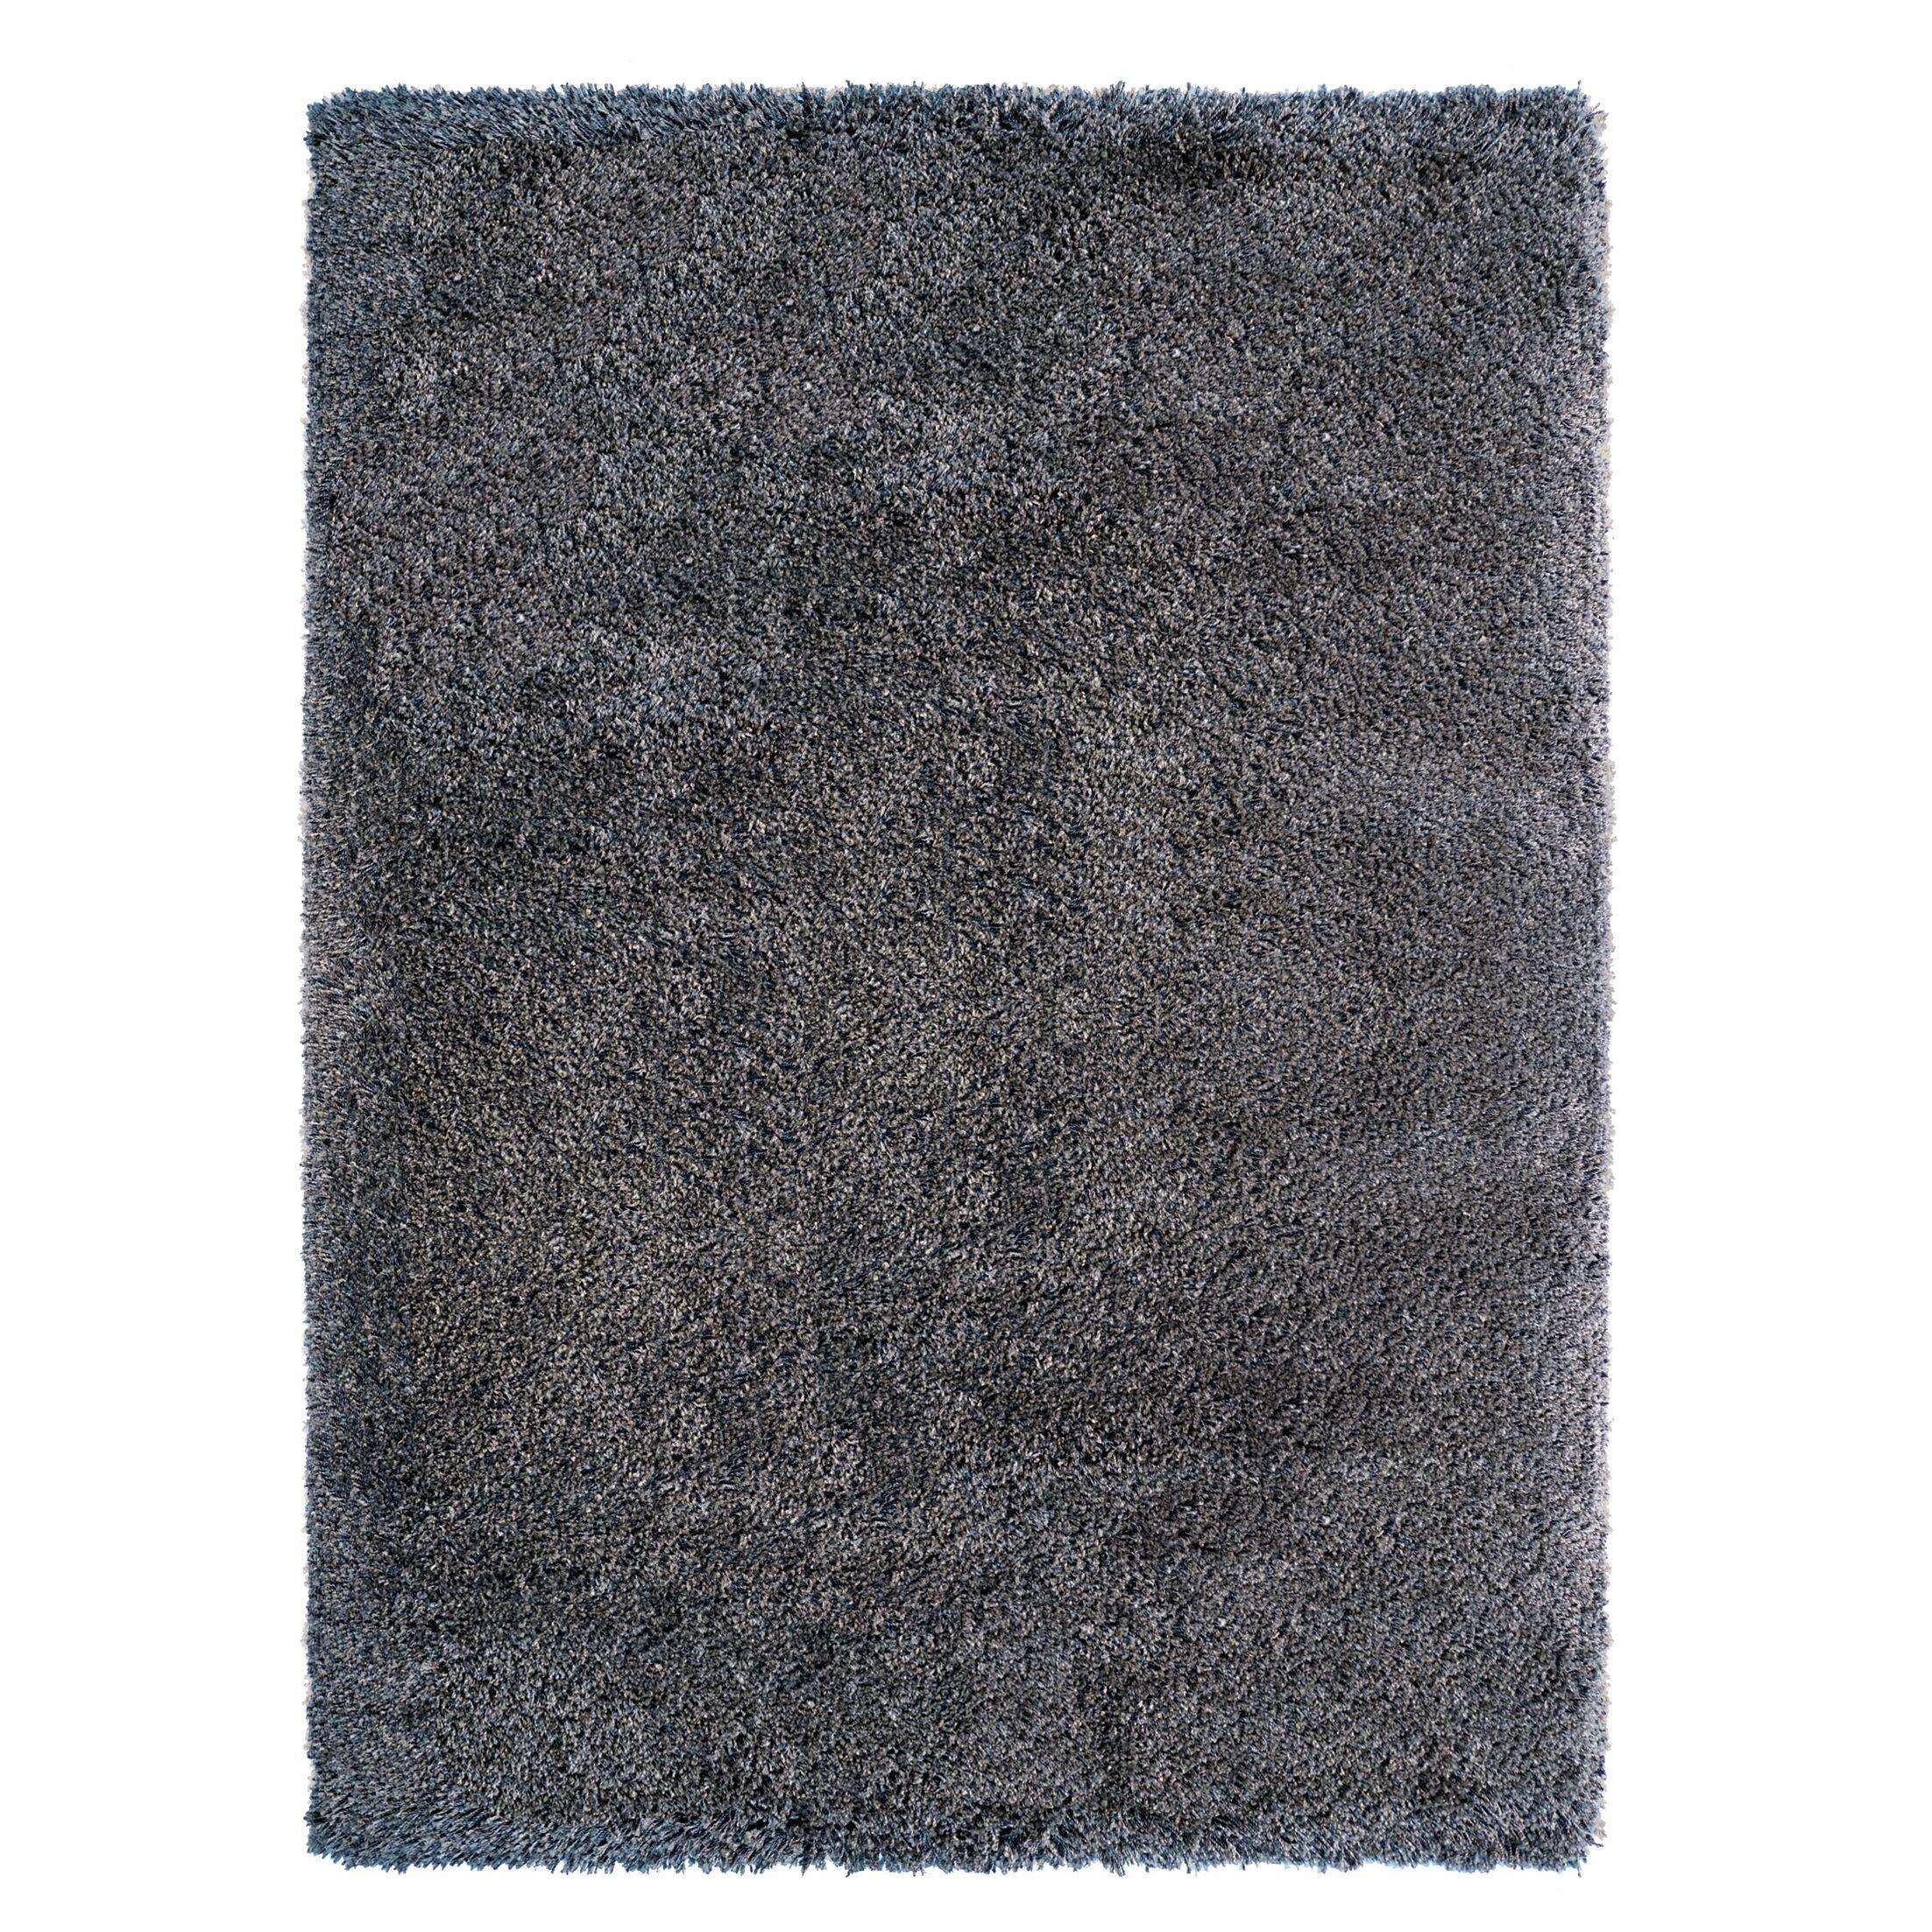 Ultimate Charcoal Area Rug Rug Size: Rectangle 7'10